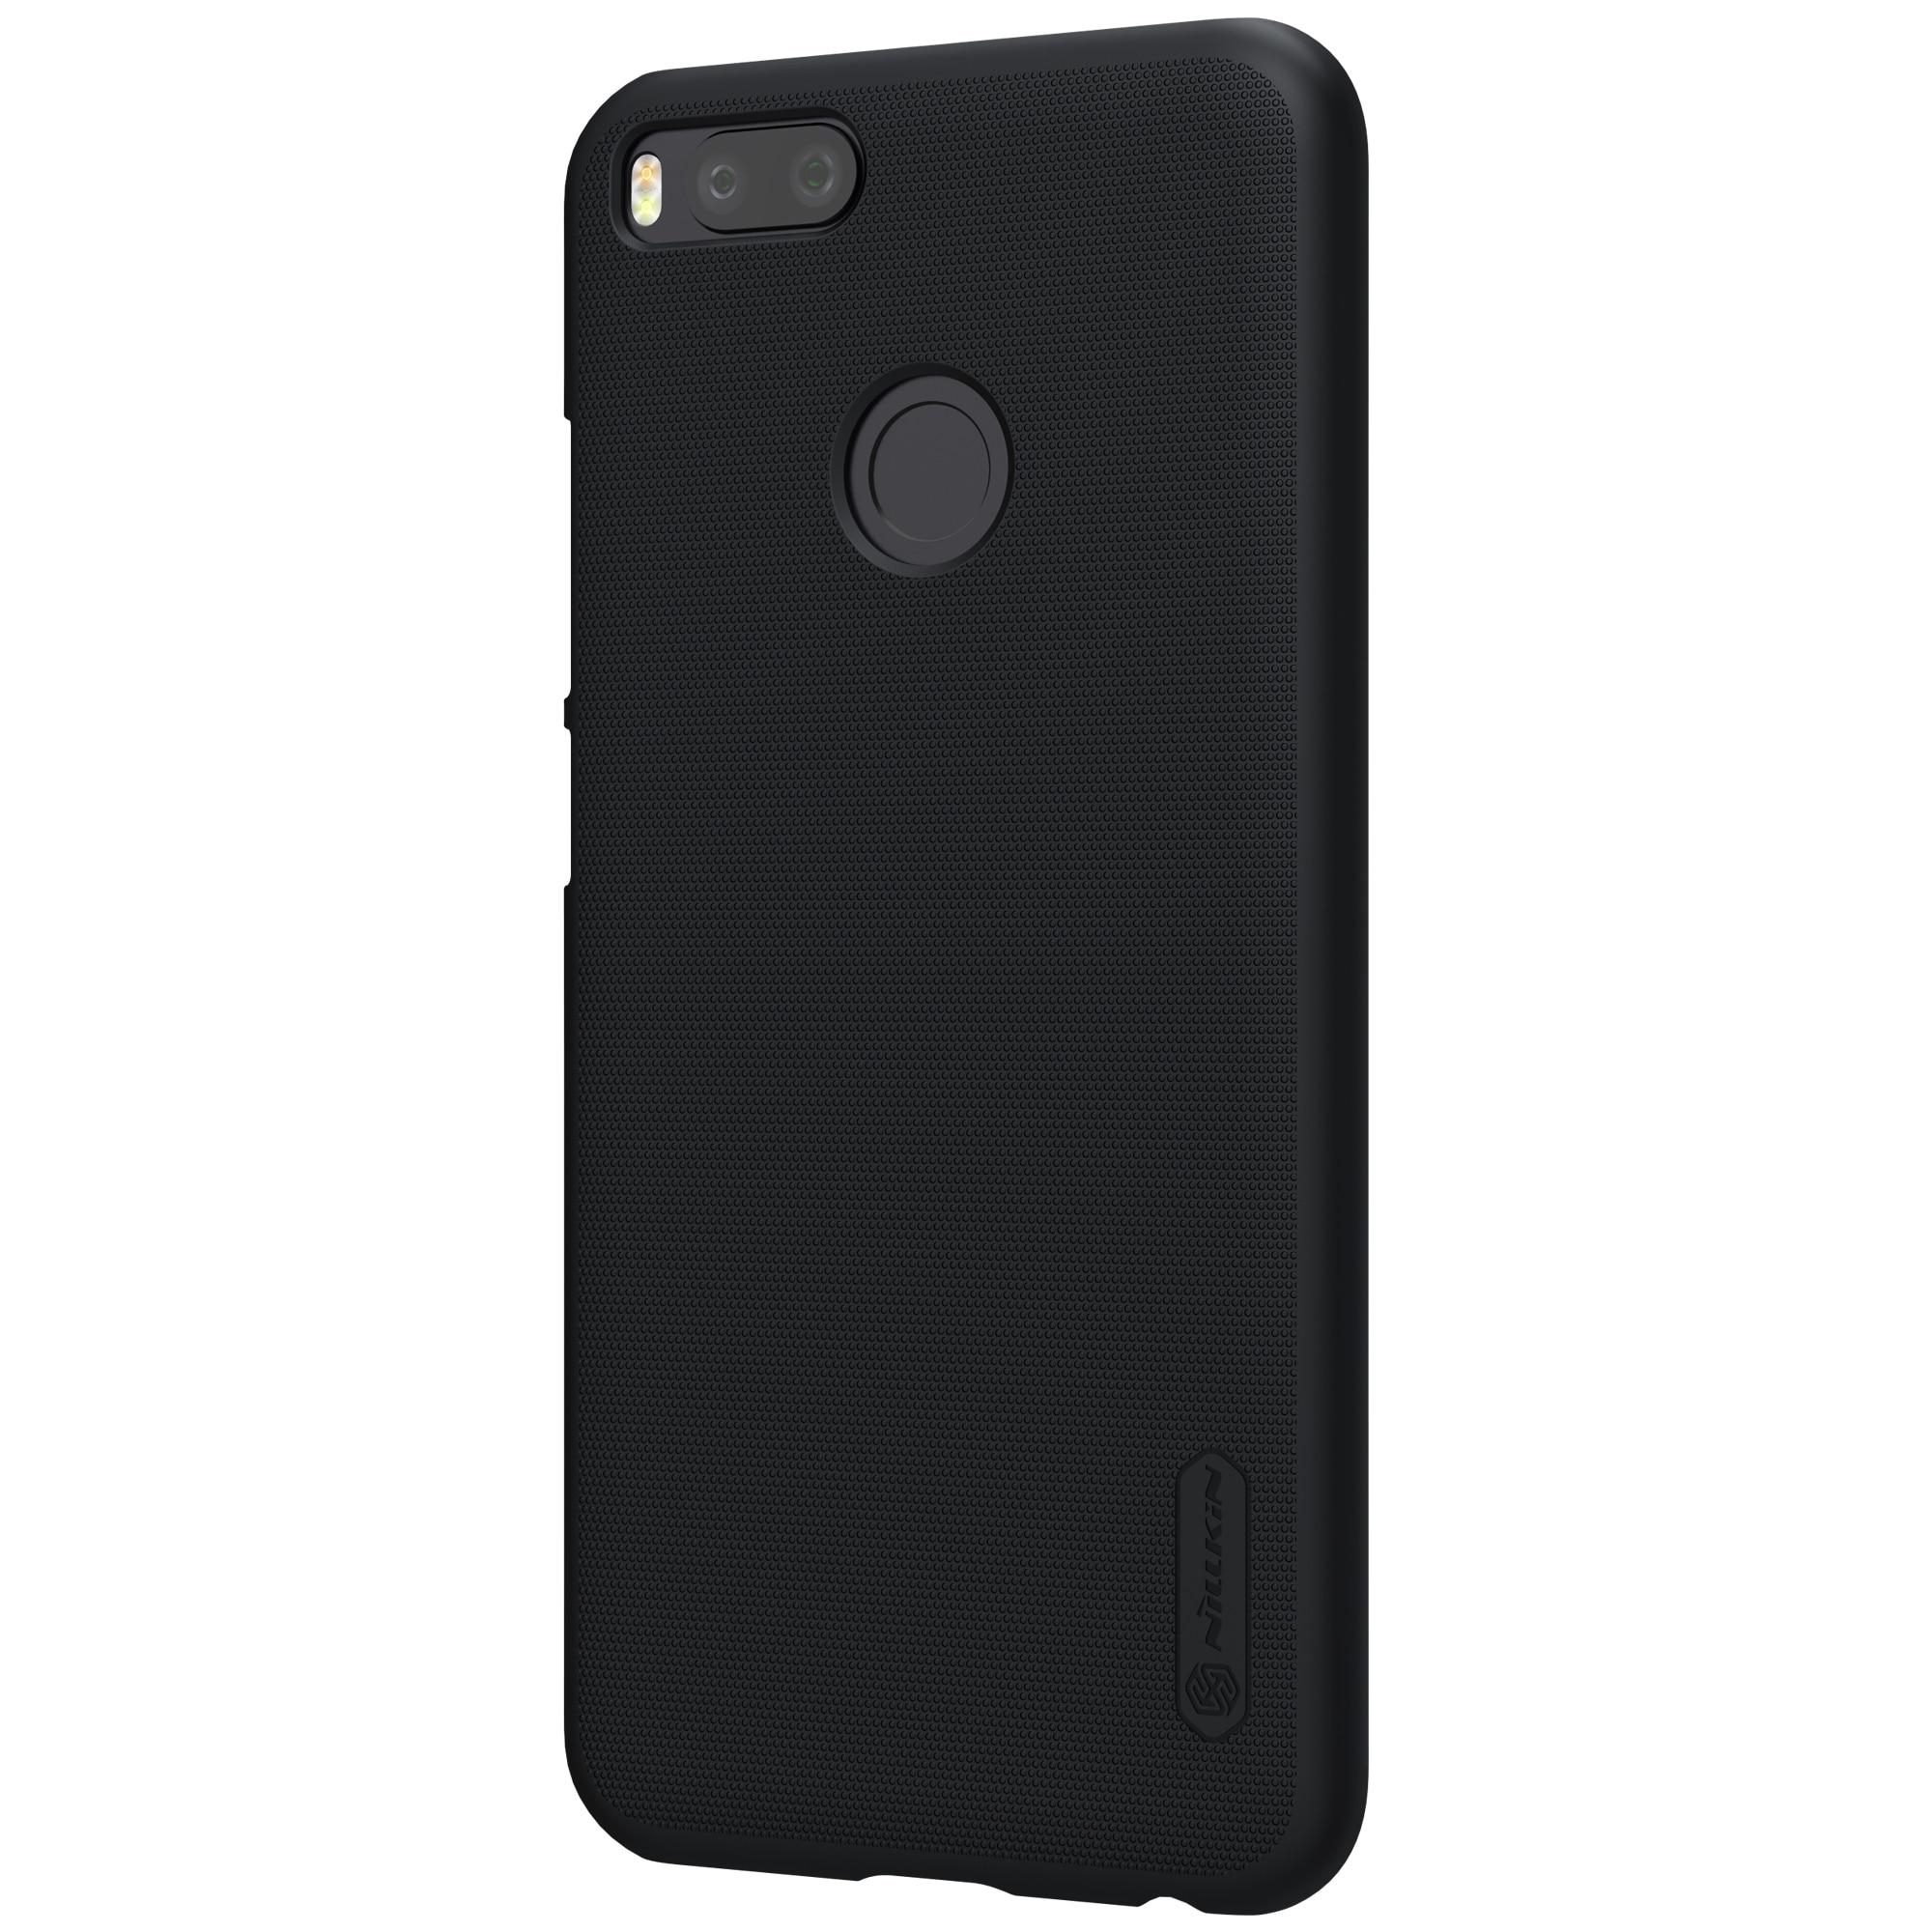 new product a10d6 d14be Xiaomi Mi A1 Case Mi A1 Matte Cover Mi 5X Case Nillkin Frosted Shield Hard  Back Case For Xiaomi MiA1 / Mi 5X / Mi5X Gift Film